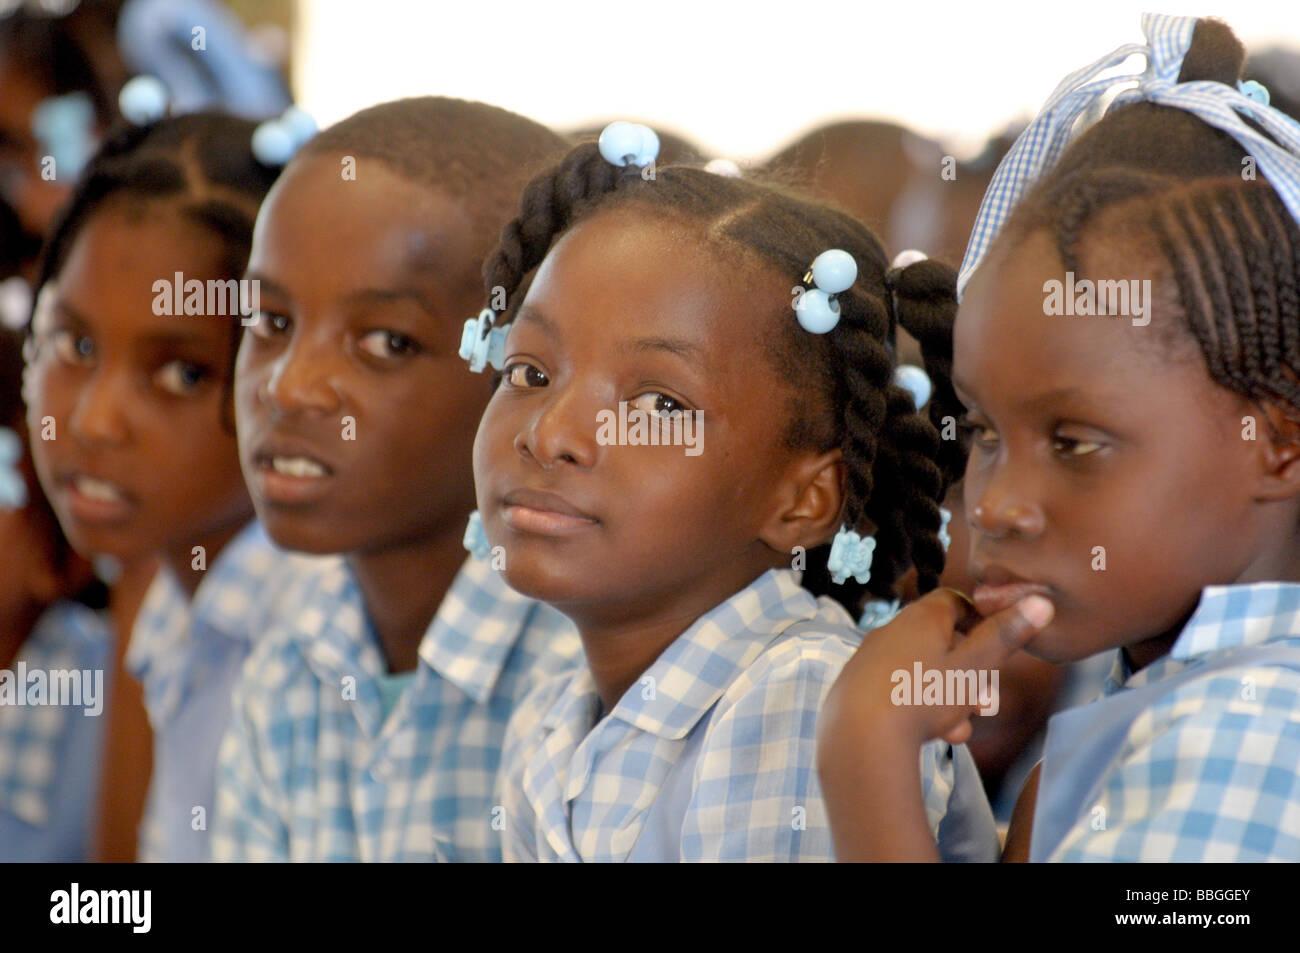 Group of beautiful black Haitian school children in blue school uniform - Stock Image